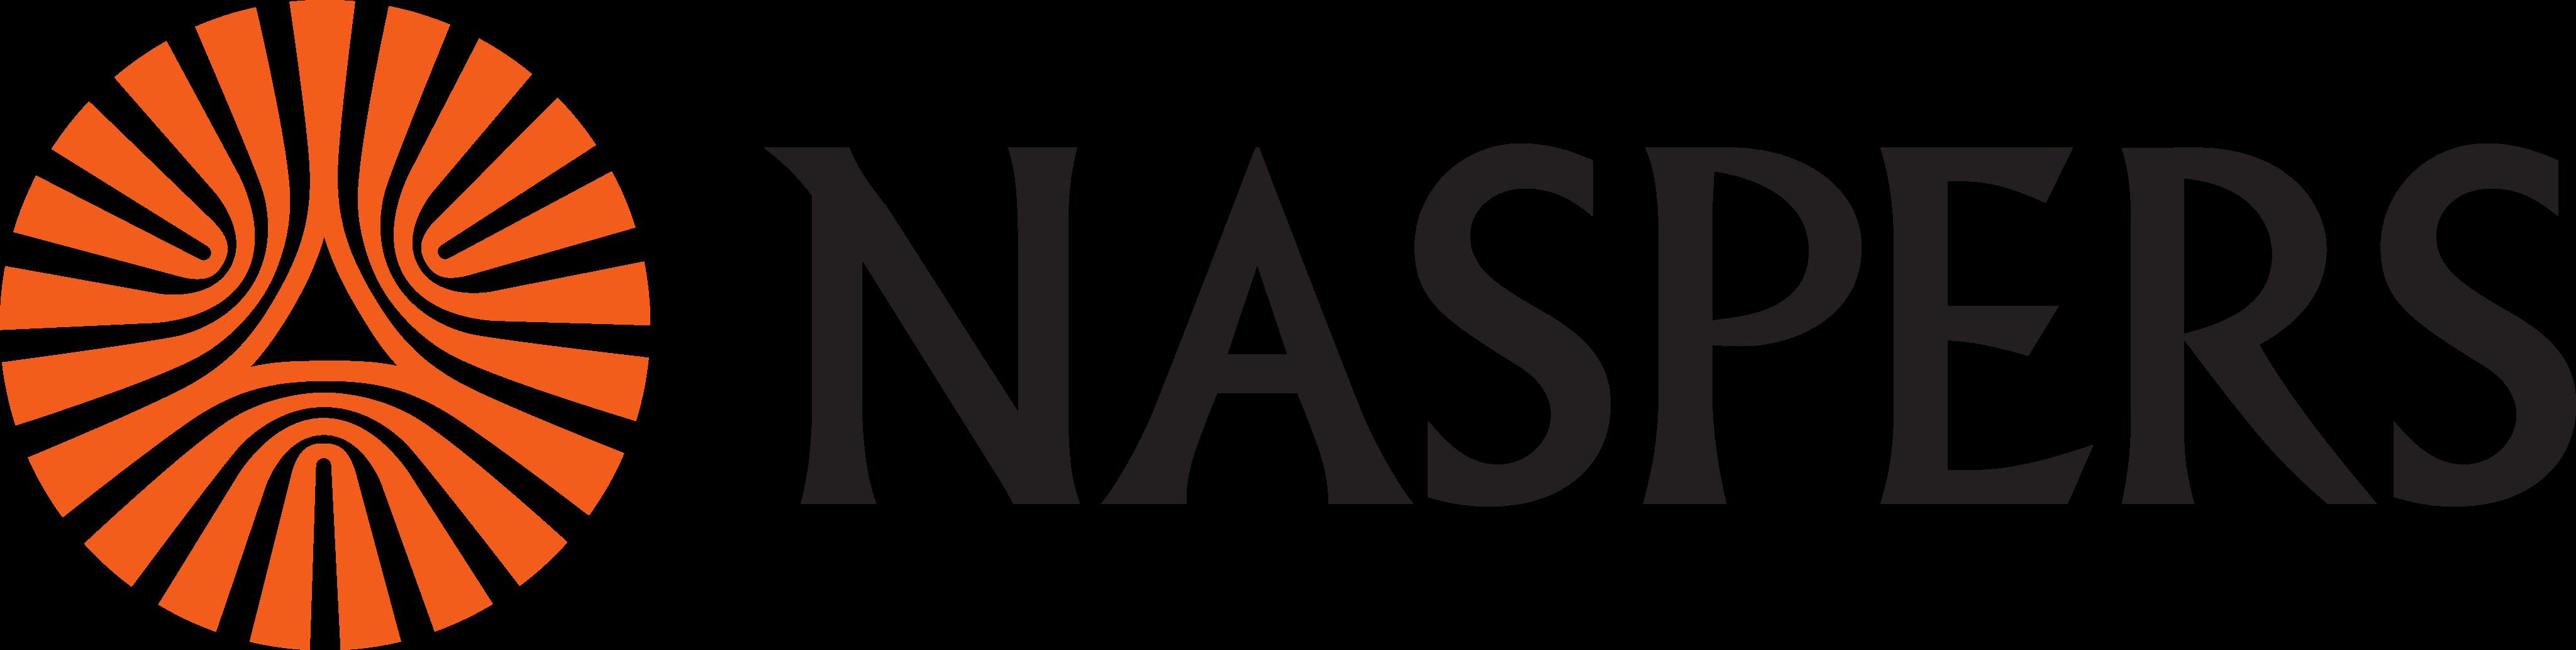 naspers logo - Naspers Logo